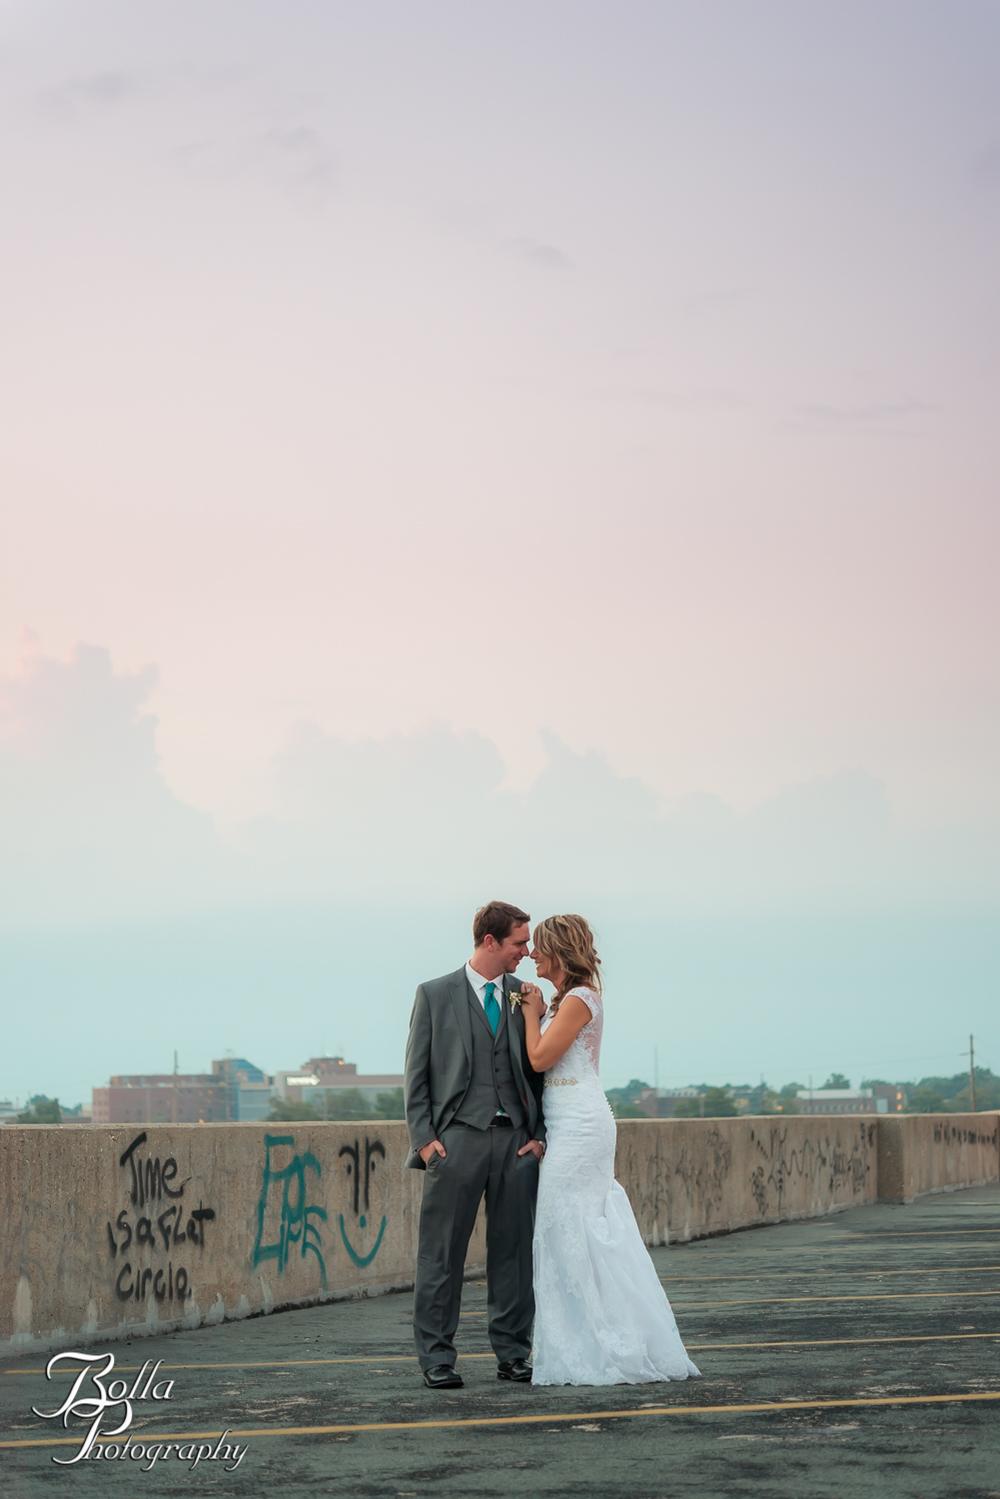 Bolla_Photography_St_Louis_wedding_photographer-0417.jpg